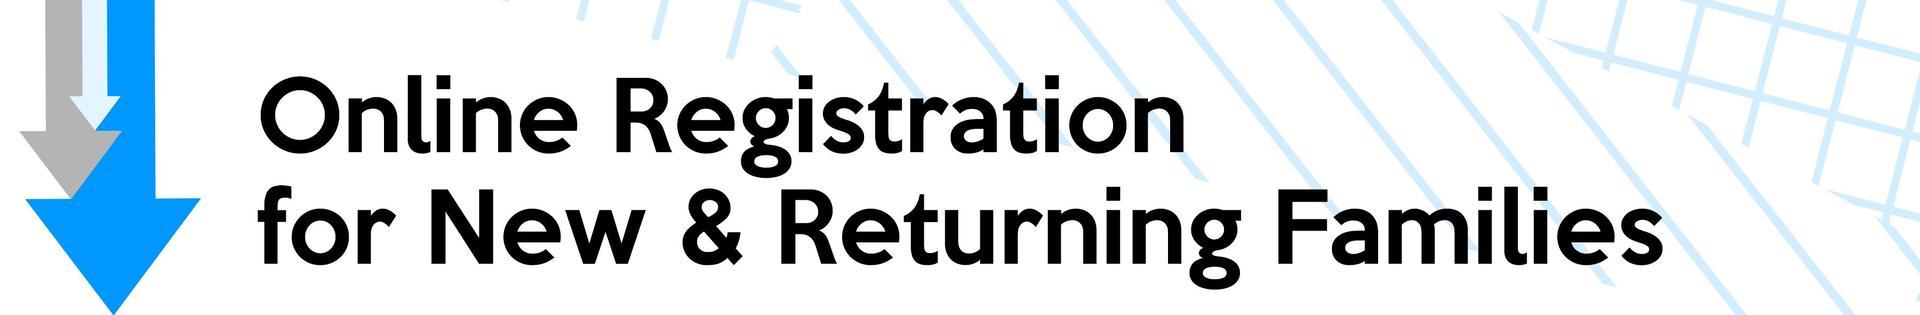 Online Registration for New & Returning Families